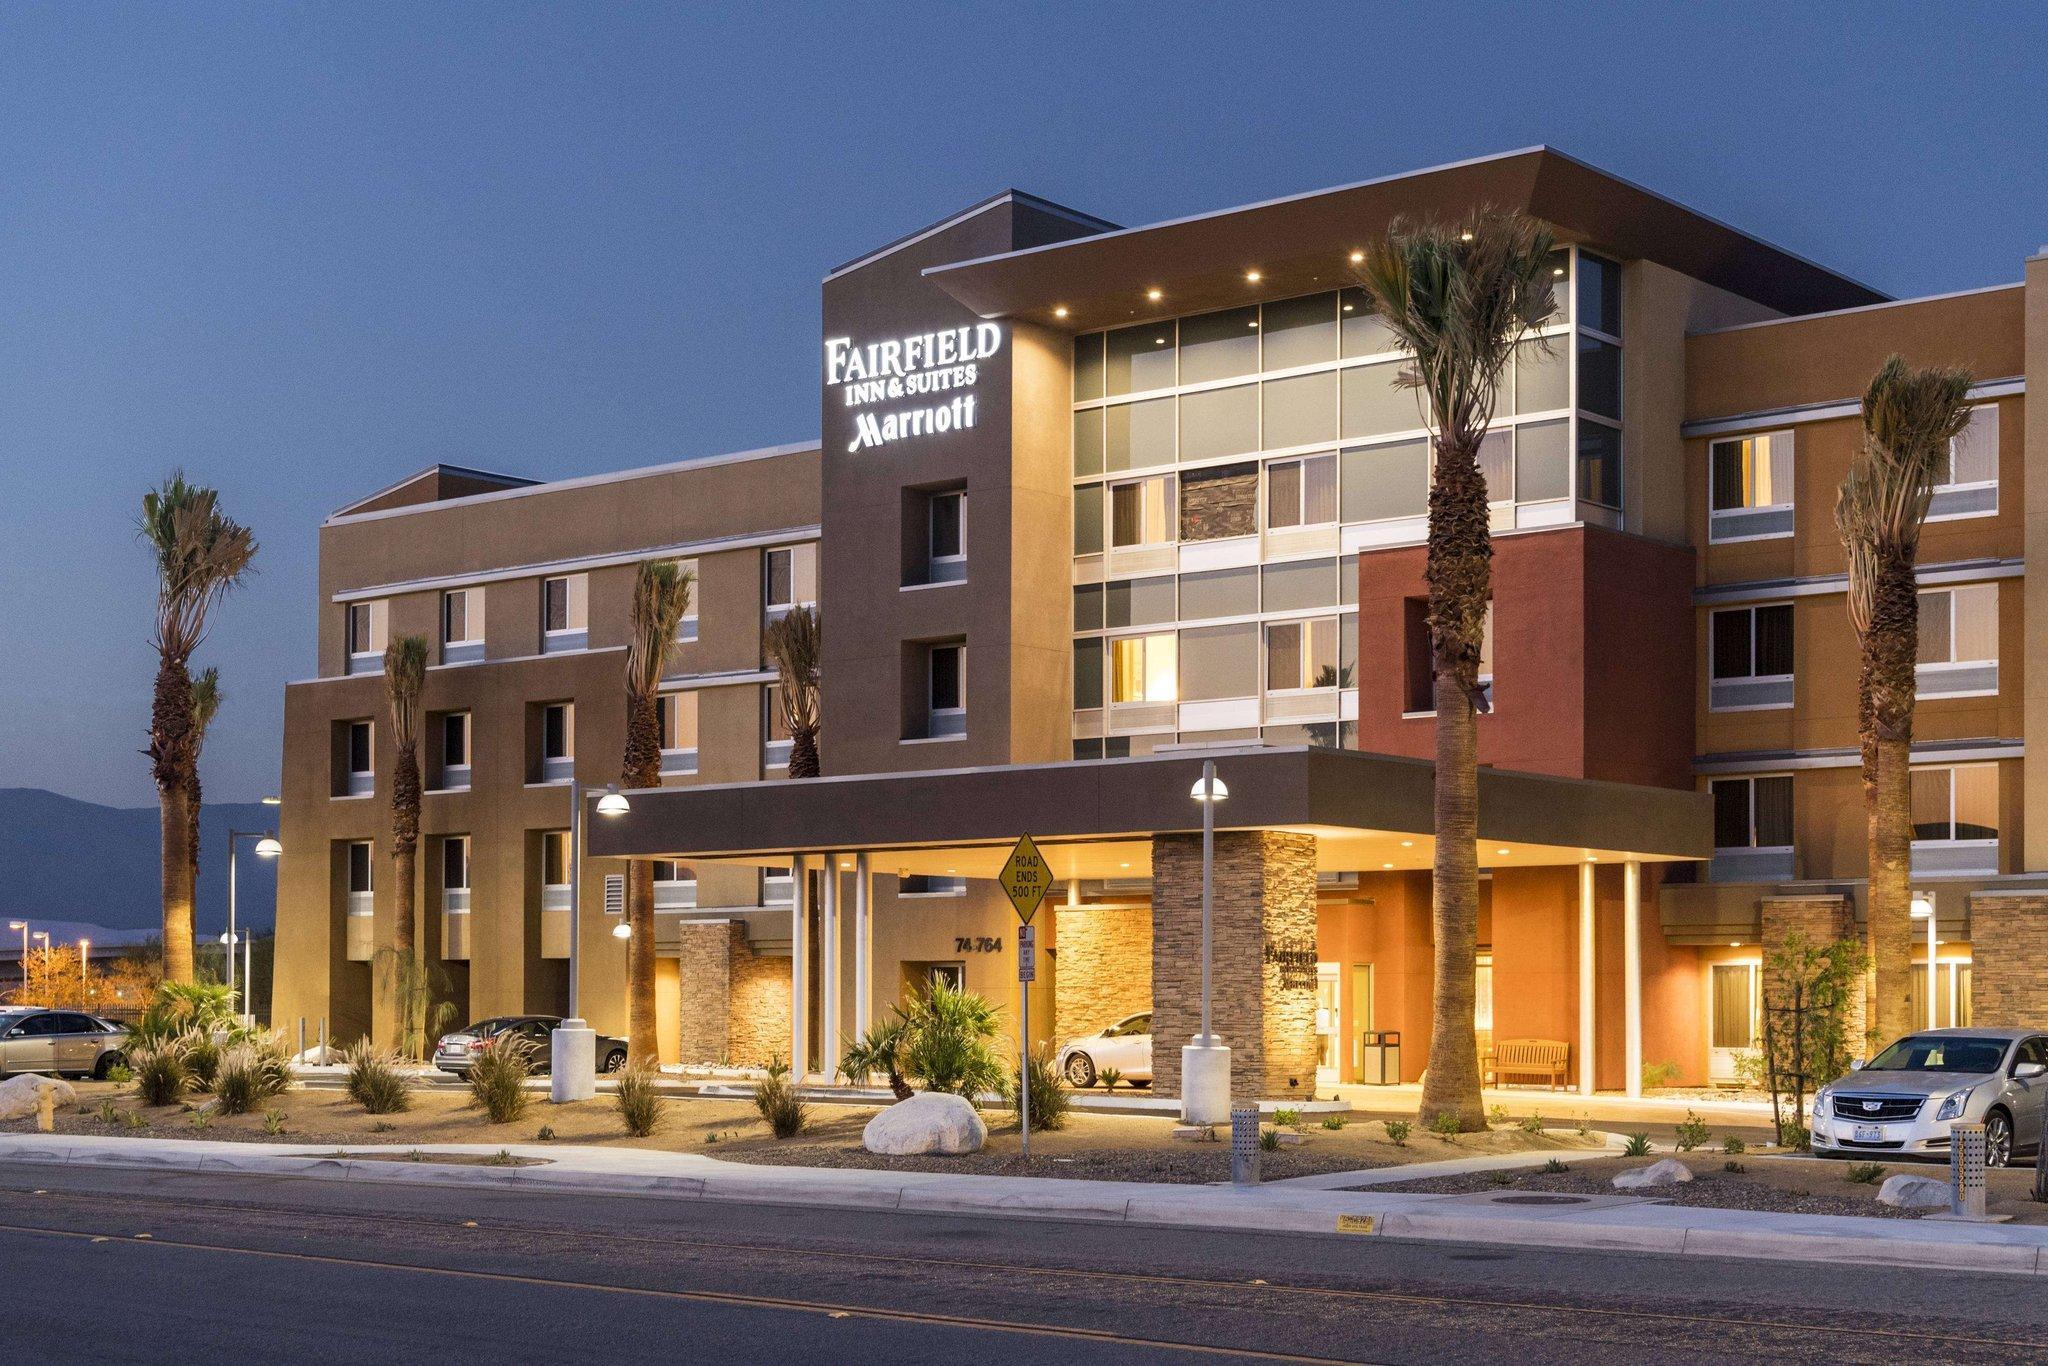 Fairfield Inn And Suites Palm Desert